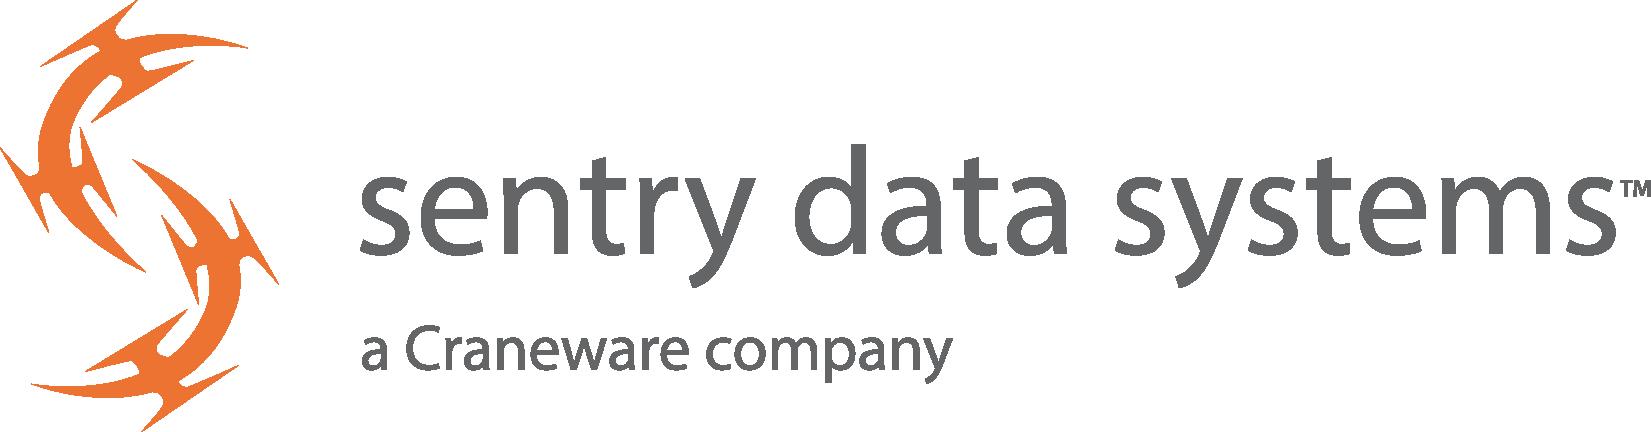 Sentry Data Systems